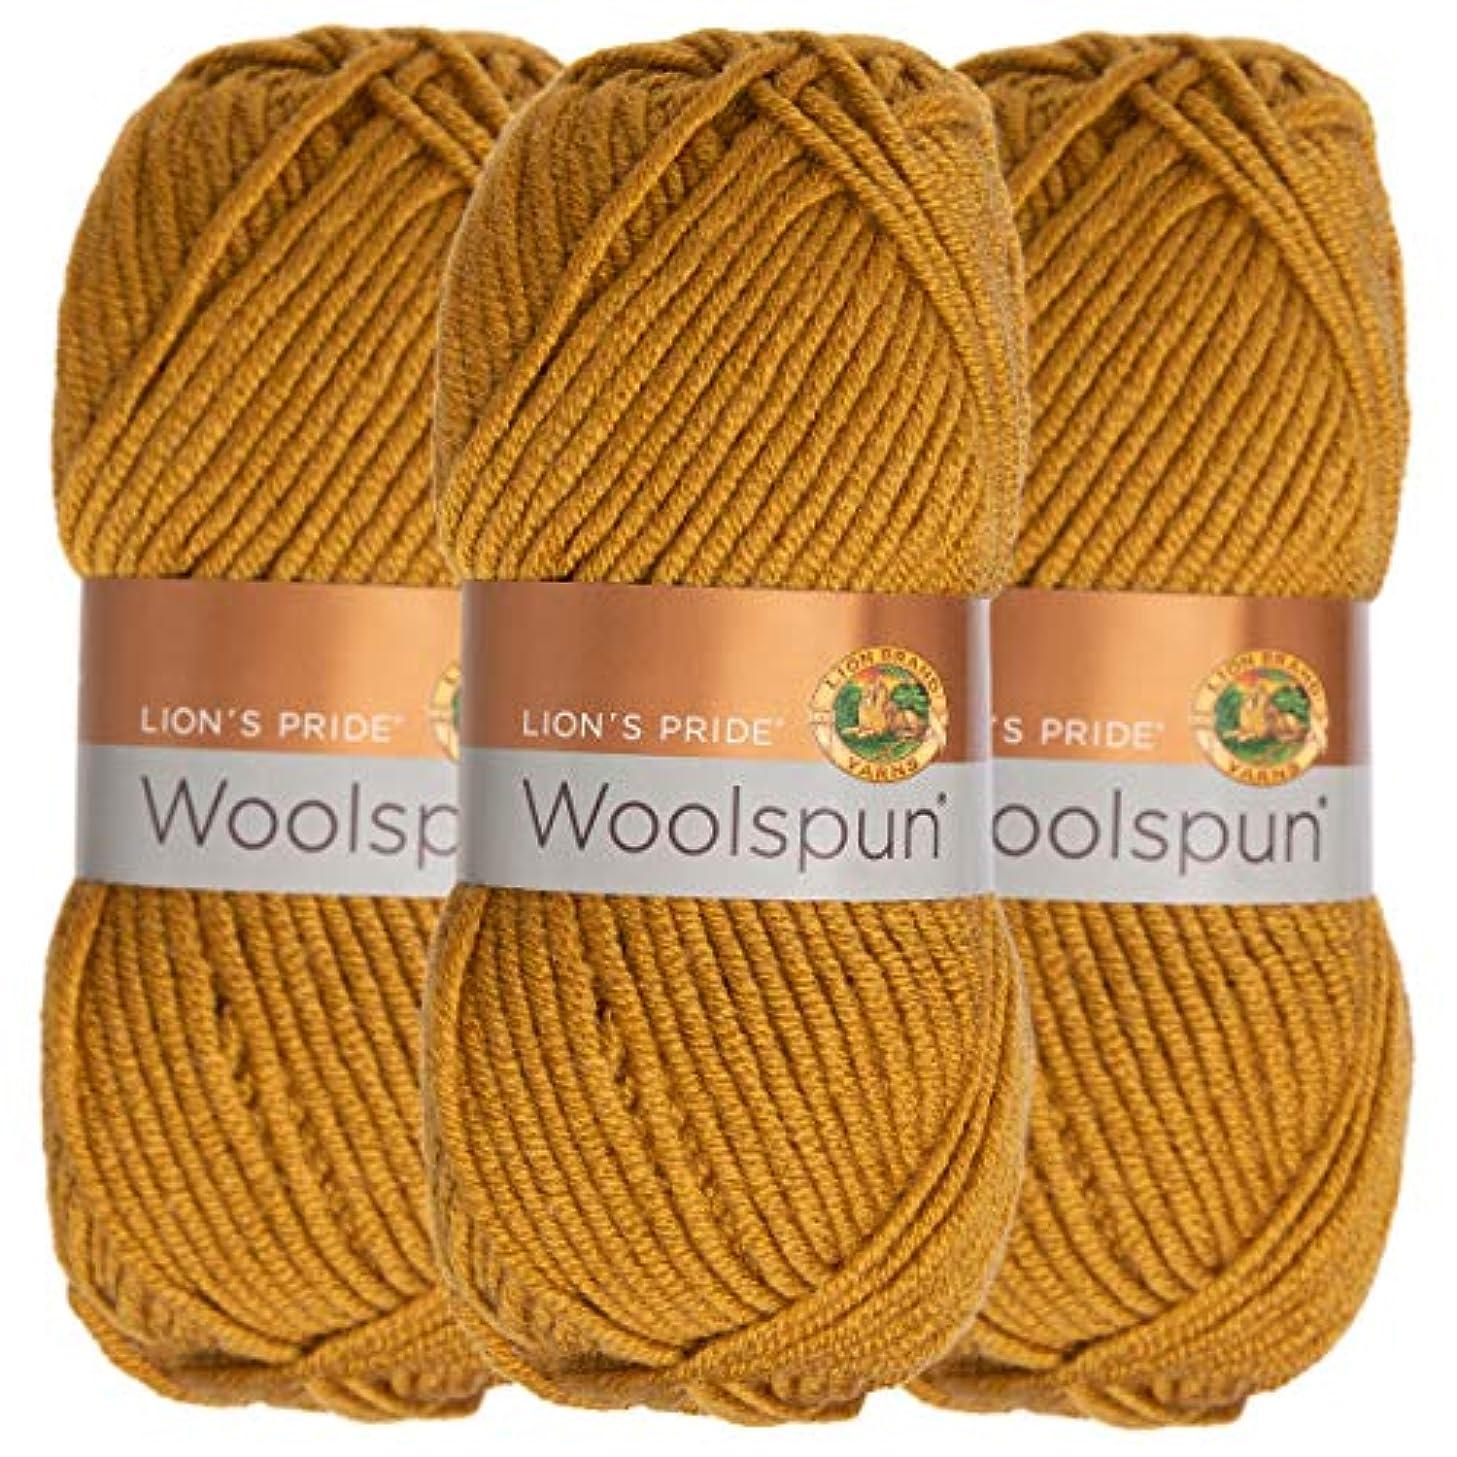 Lion Brand (3 Pack) Woolspun Acrylic & Wool Soft Honey Amber Yarn for Knitting Crocheting Bulky #5